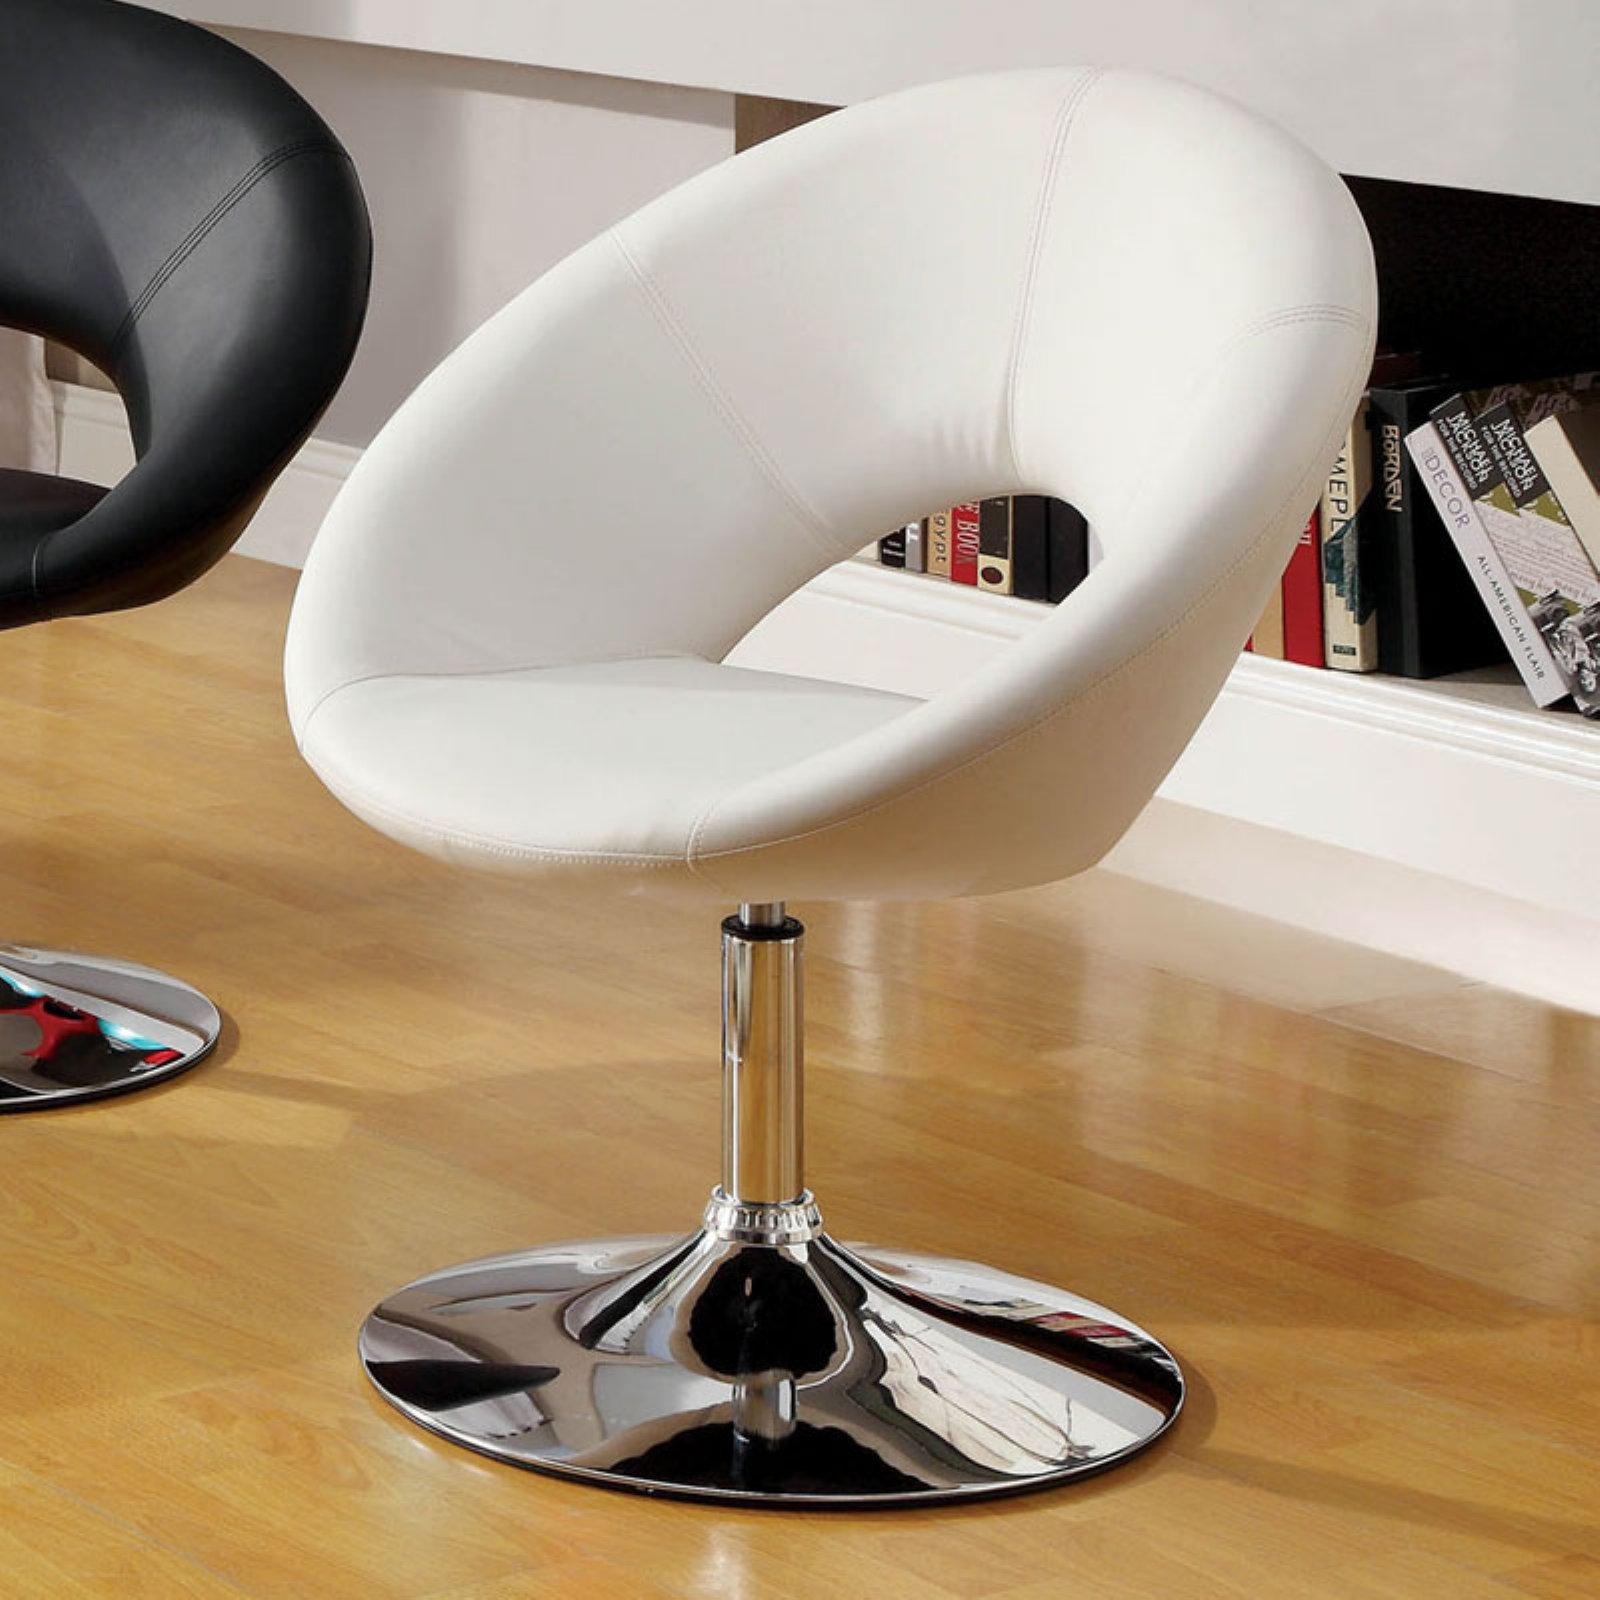 Furniture of America Grandale Padded Leatherette Swivel Chair